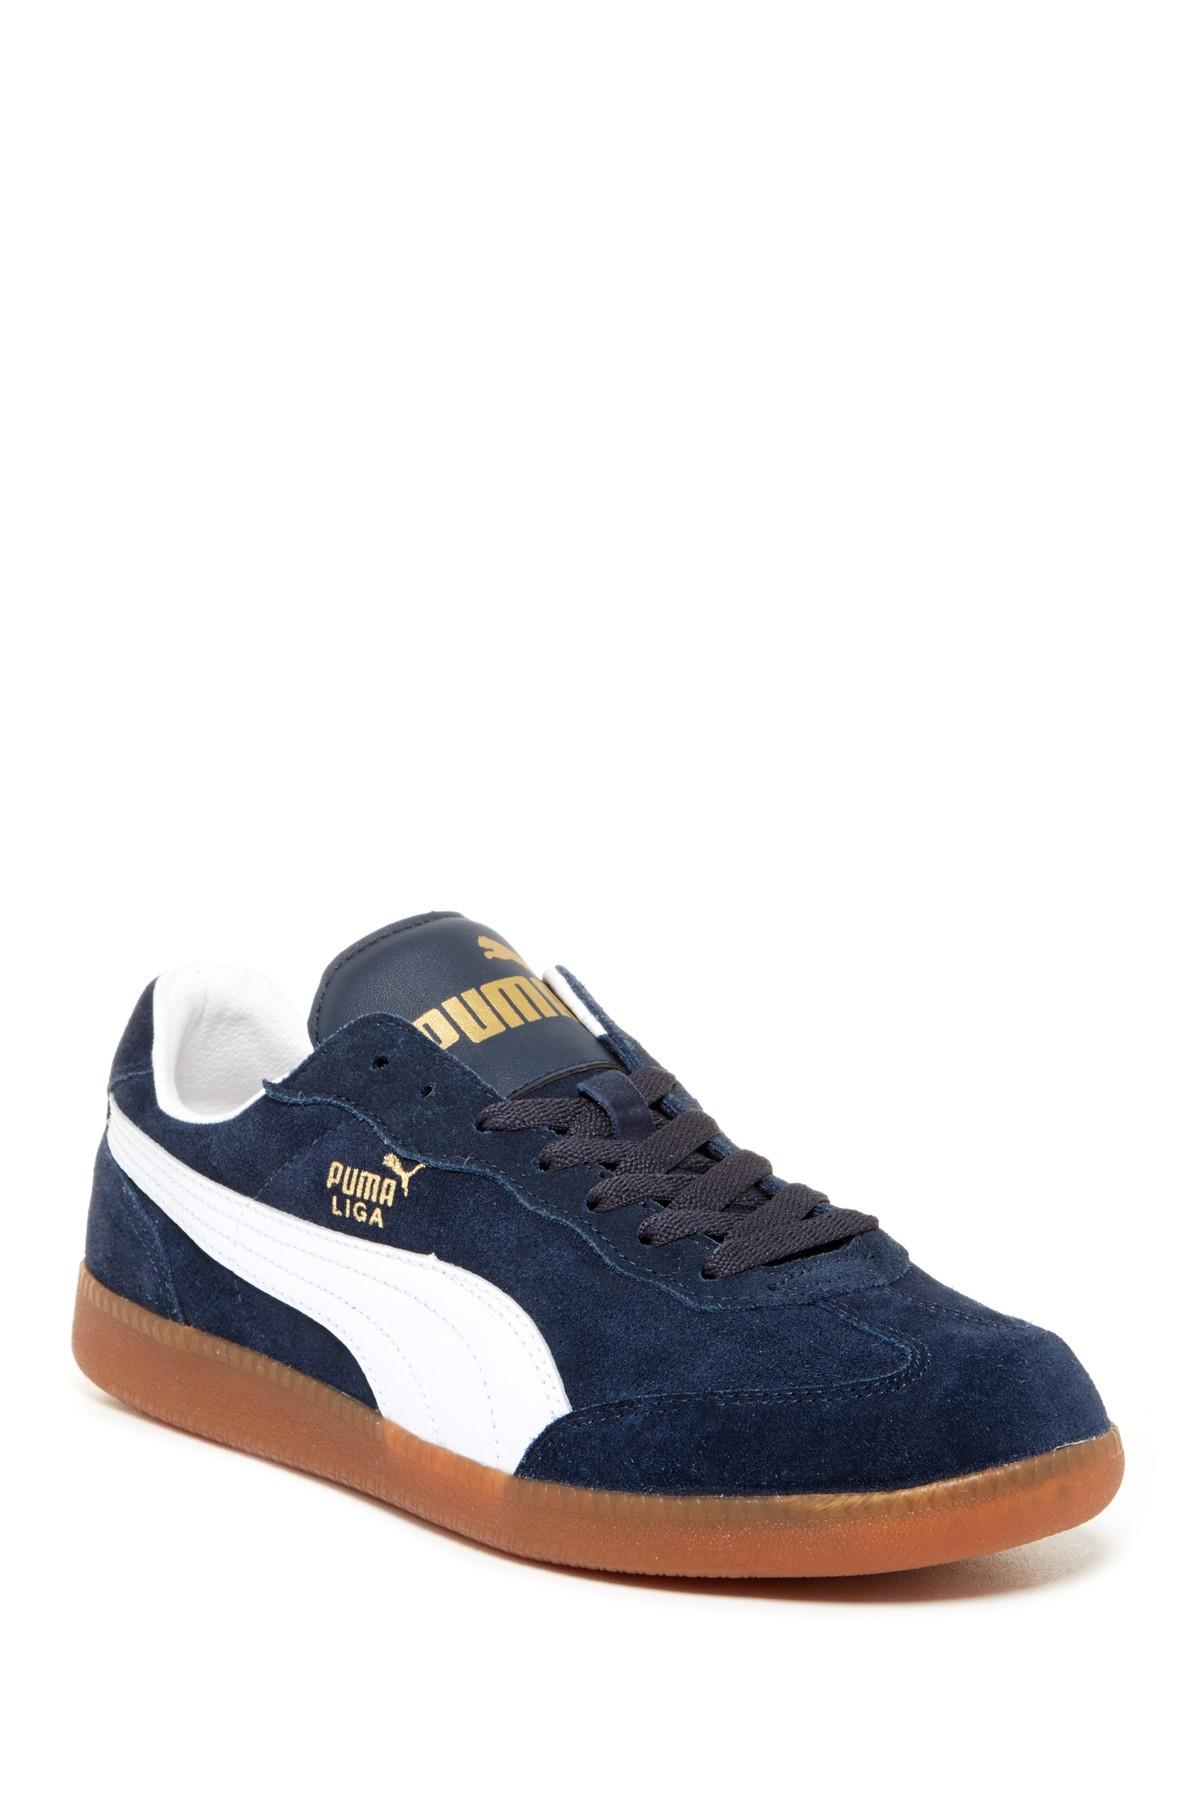 PUMA Liga Suede Sneaker in Navy-White (Blue) for Men - Lyst